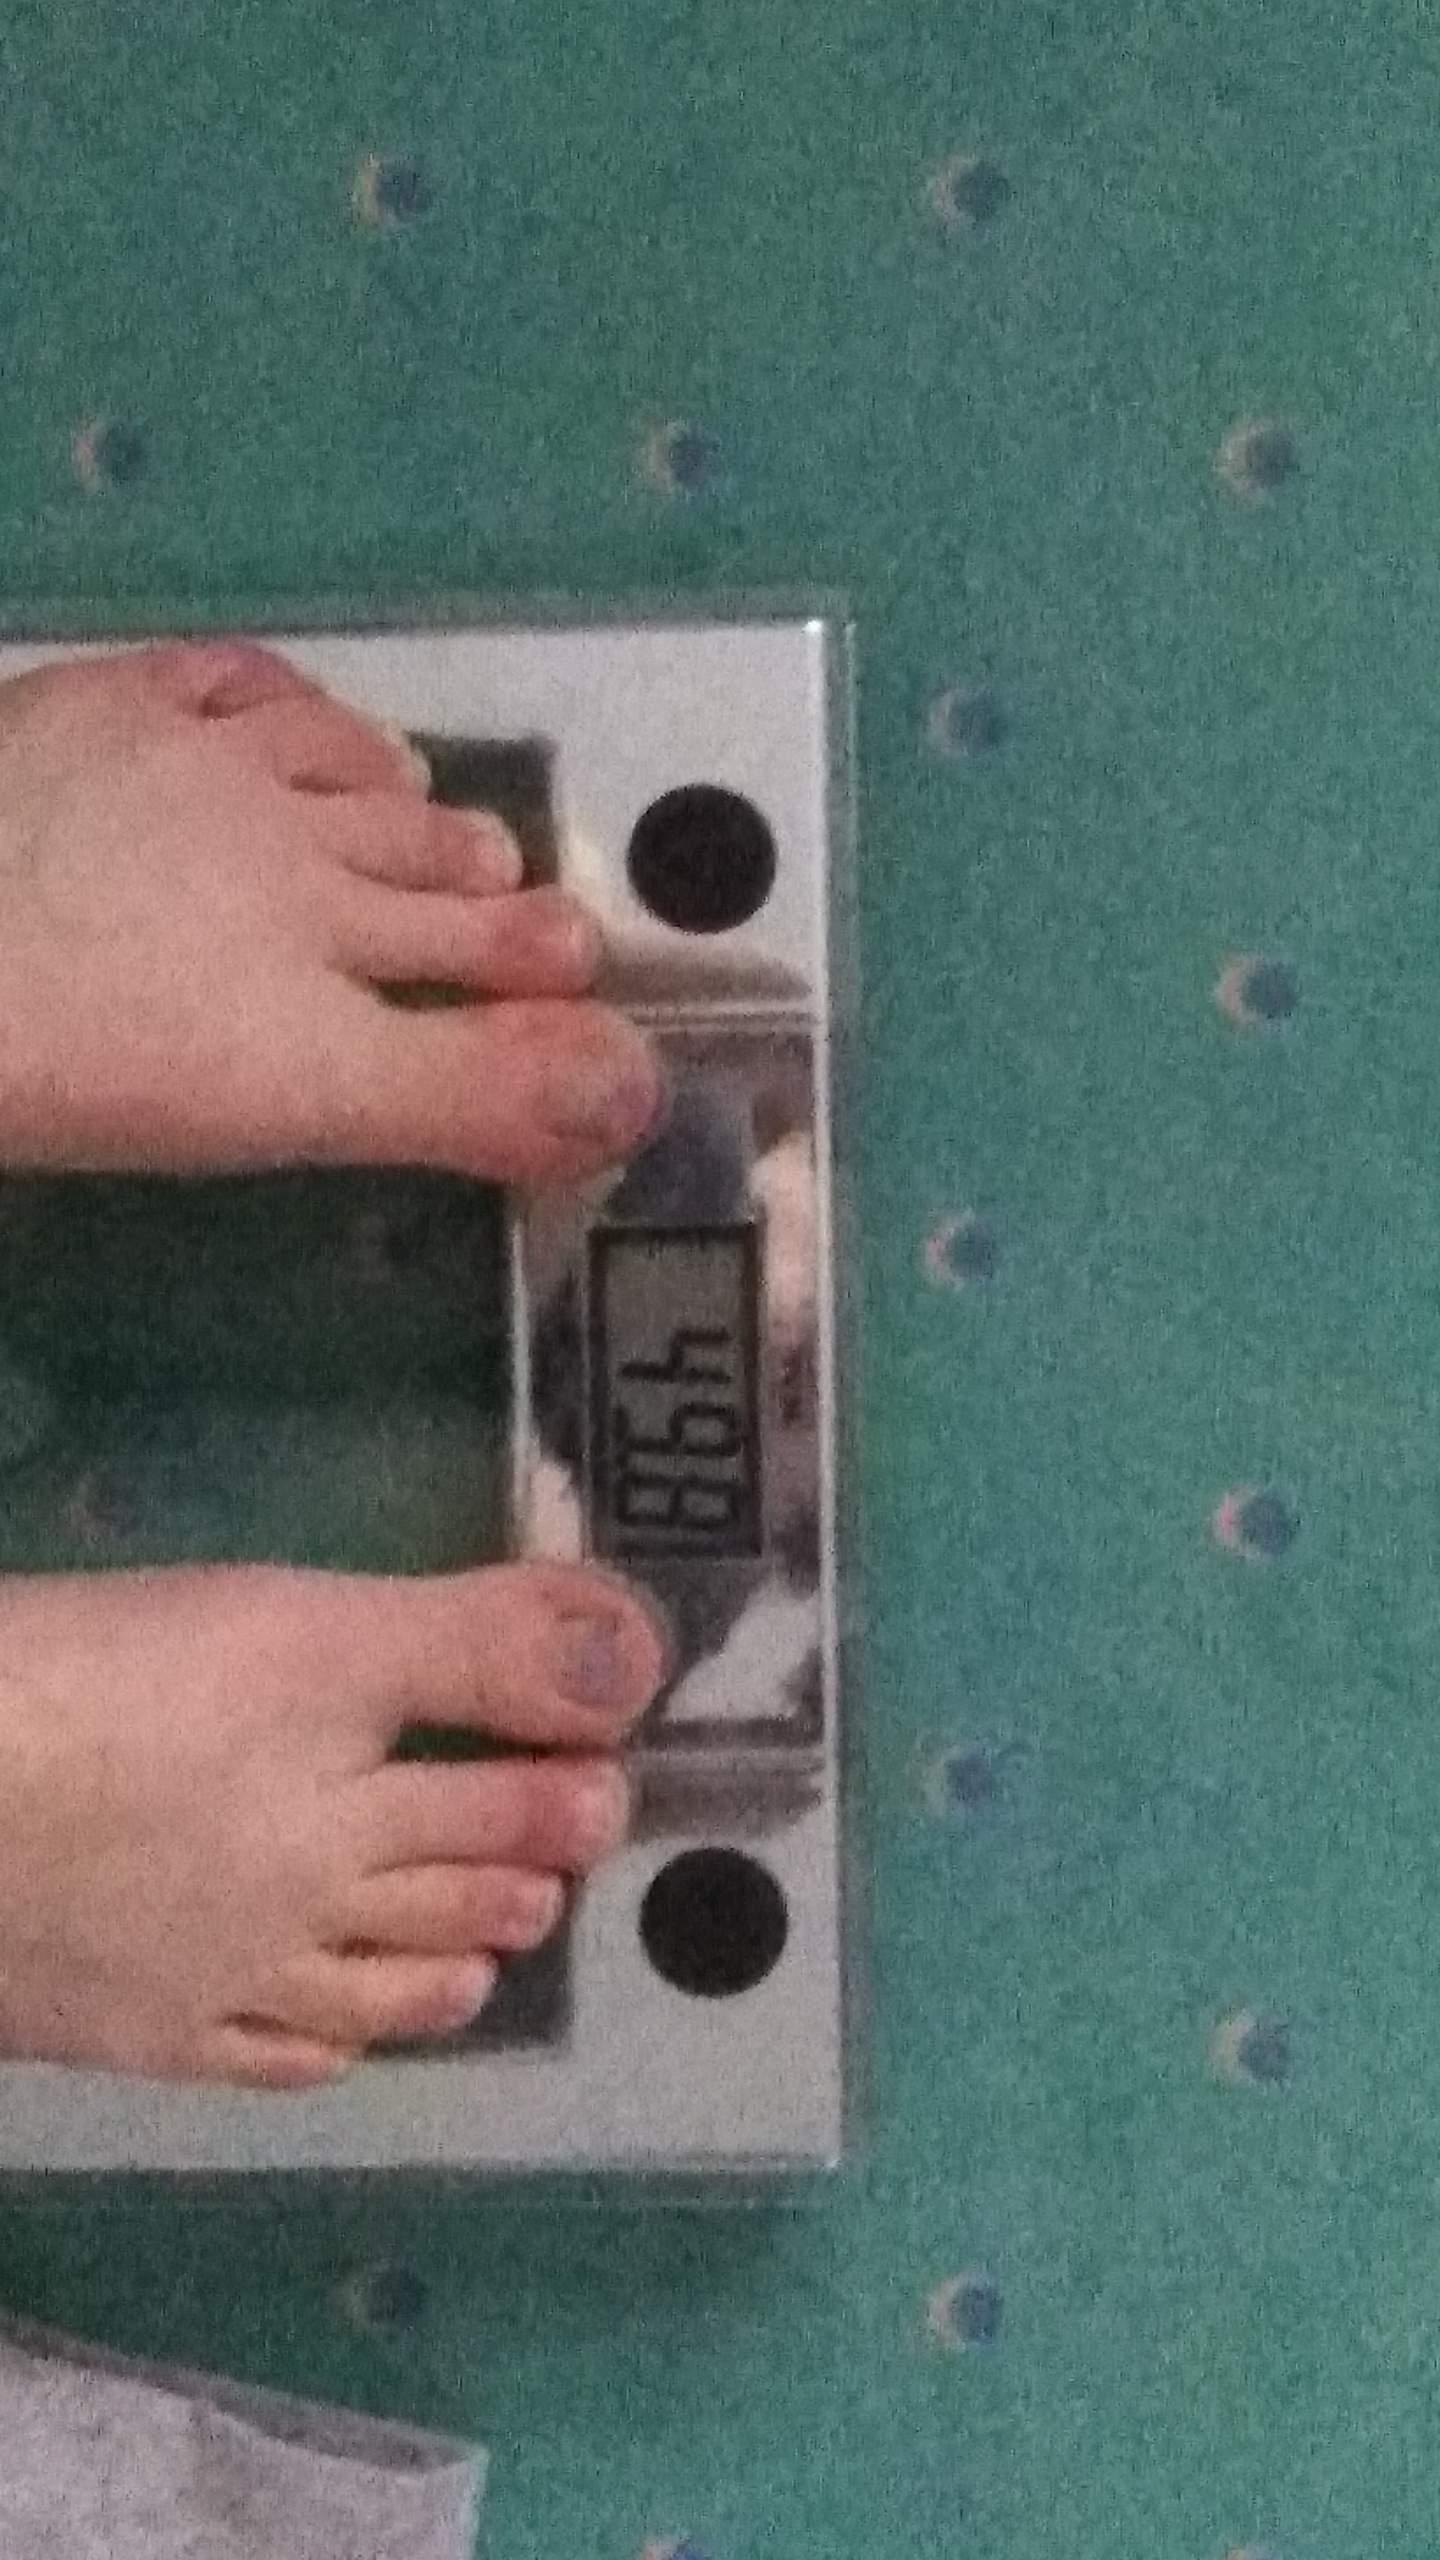 Bin ich zu dick bzw. Zu Fett? (abnehmen, Diät)